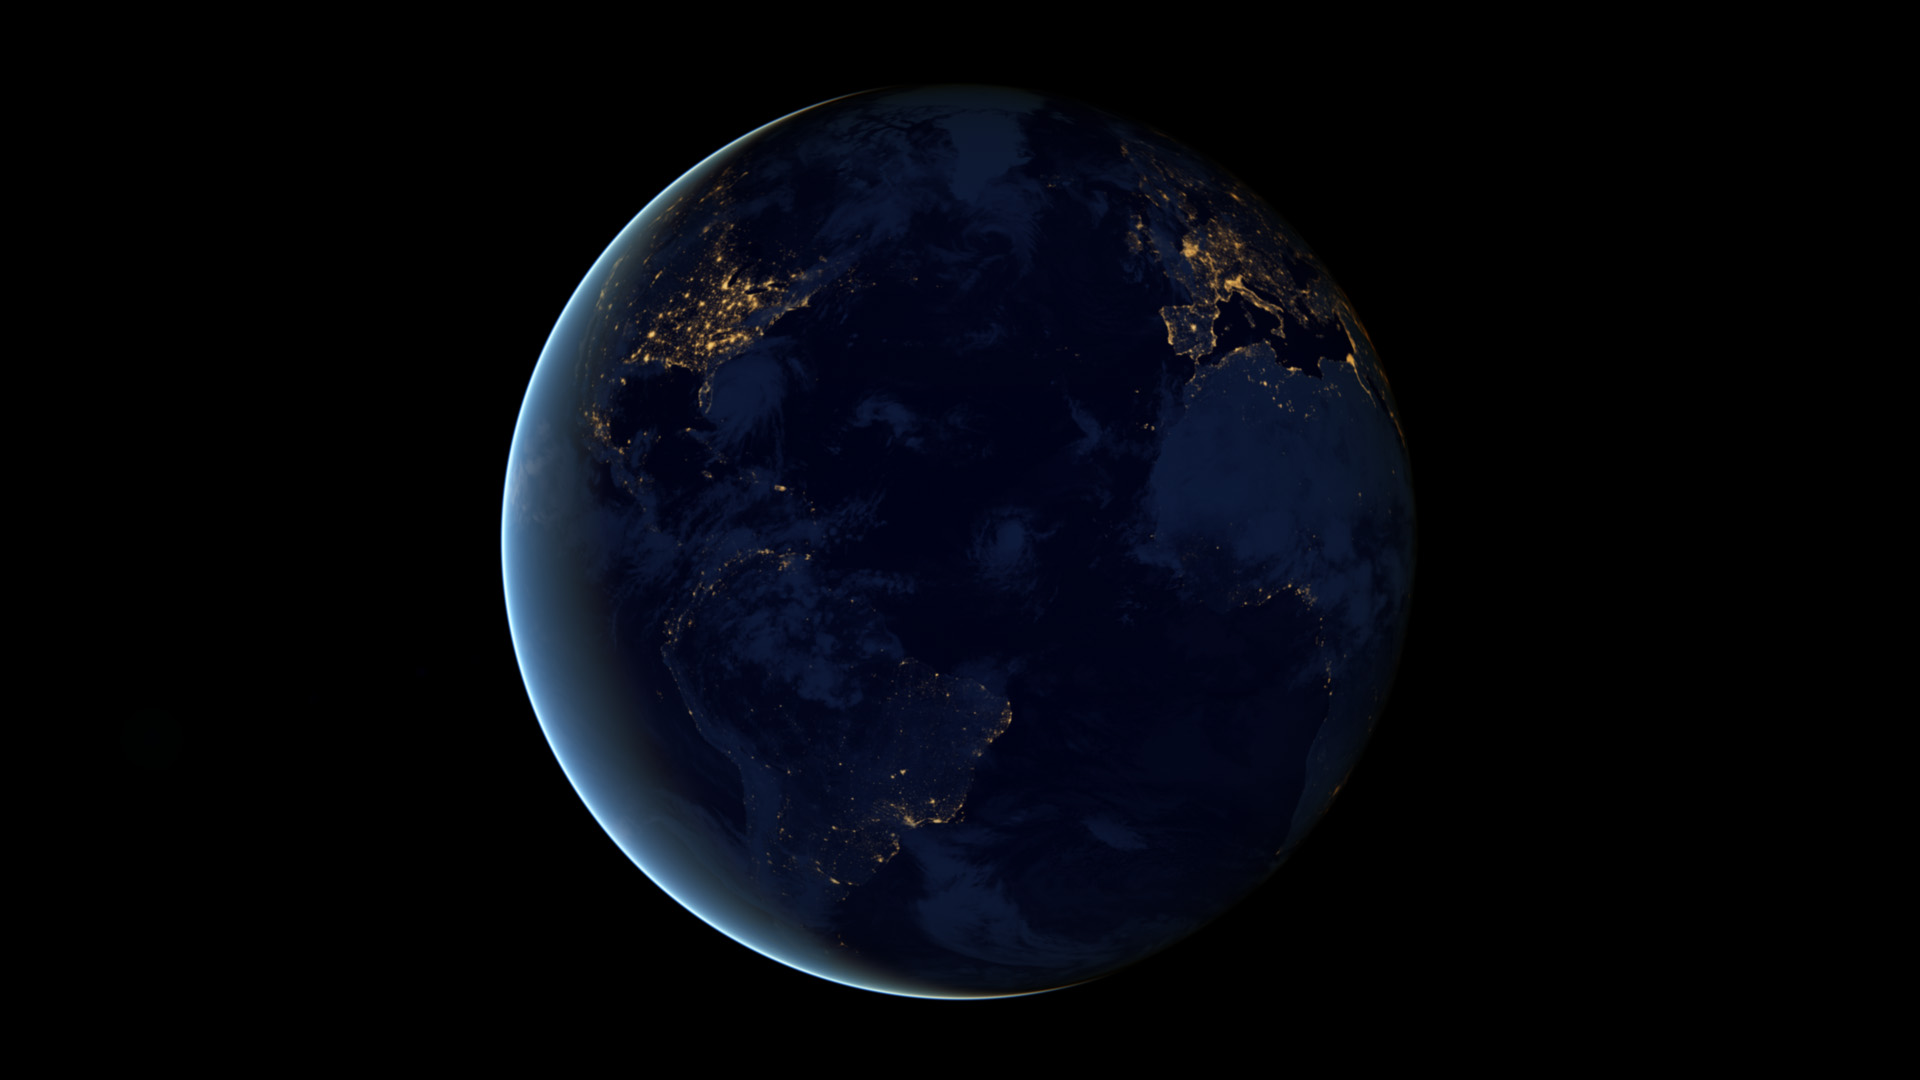 https://i0.wp.com/eoimages.gsfc.nasa.gov/images/imagerecords/79000/79803/earth_night_rotate_lrg.jpg